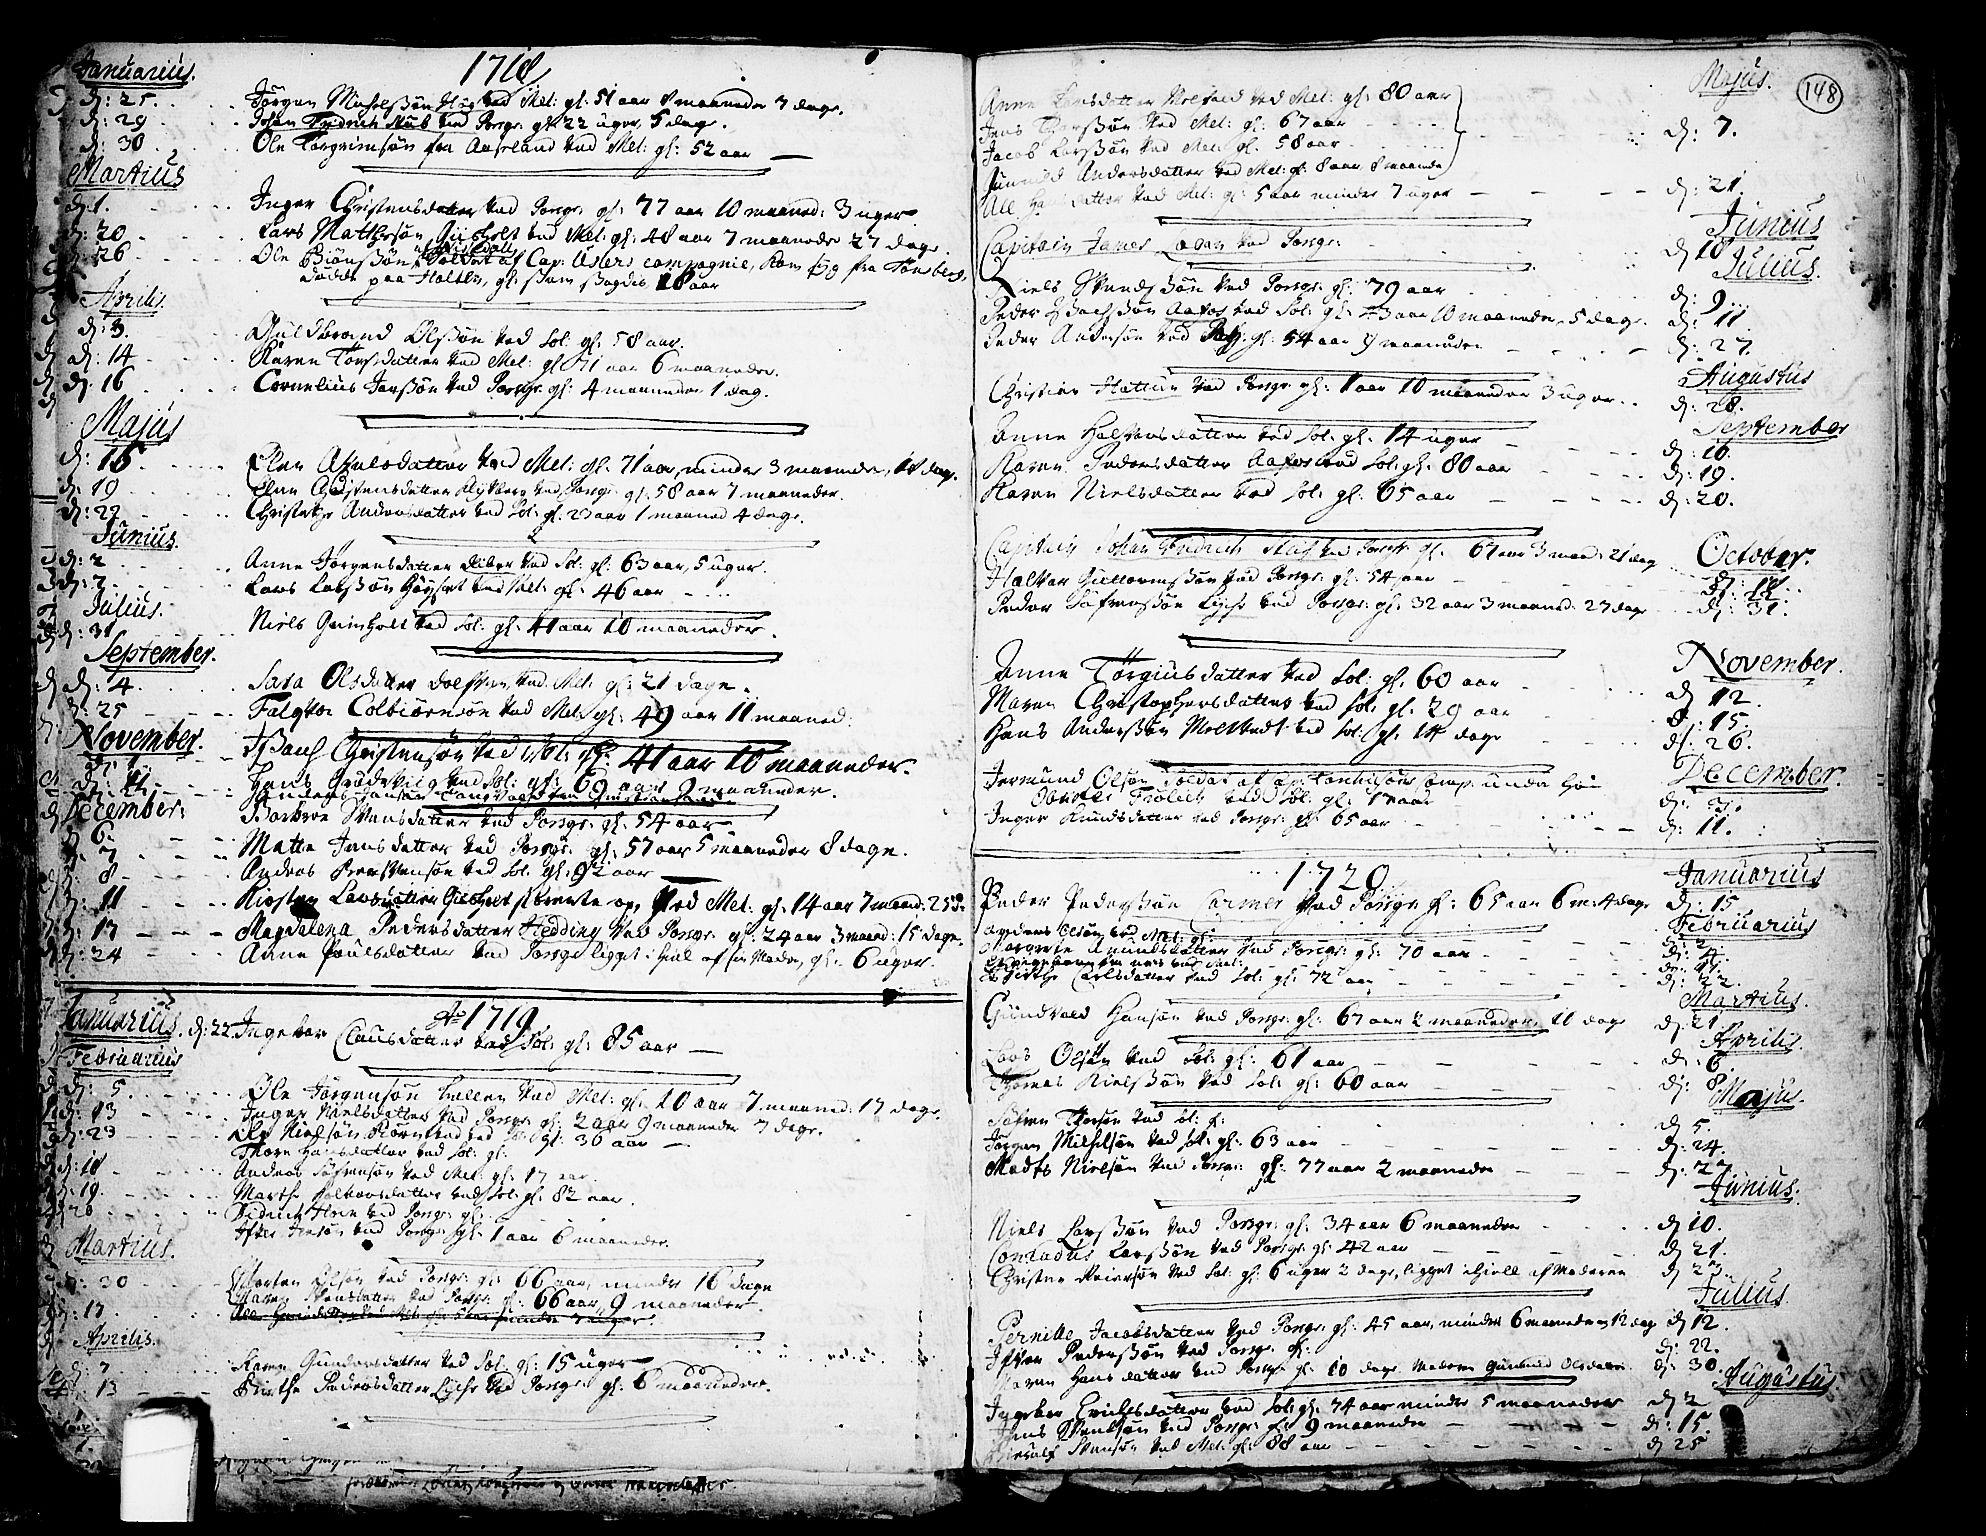 SAKO, Solum kirkebøker, F/Fa/L0002: Ministerialbok nr. I 2, 1713-1761, s. 148